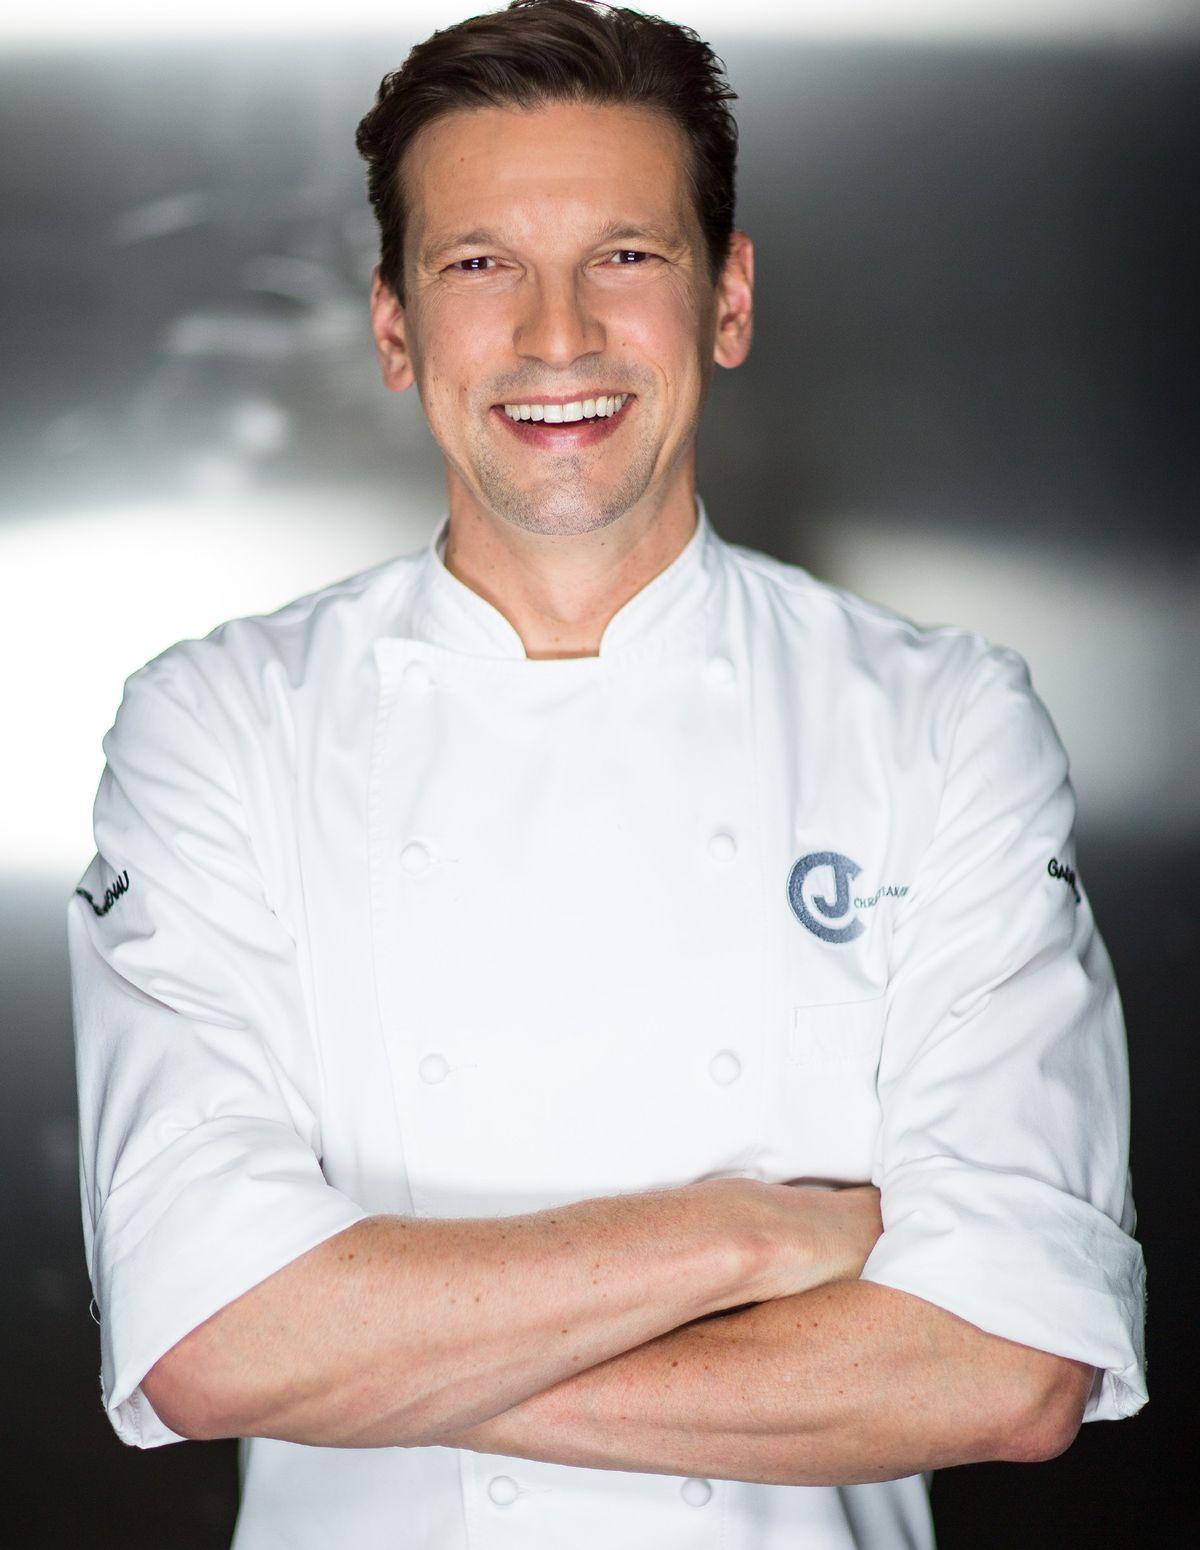 Christian Jürgens: My Finest Culinary Secrets